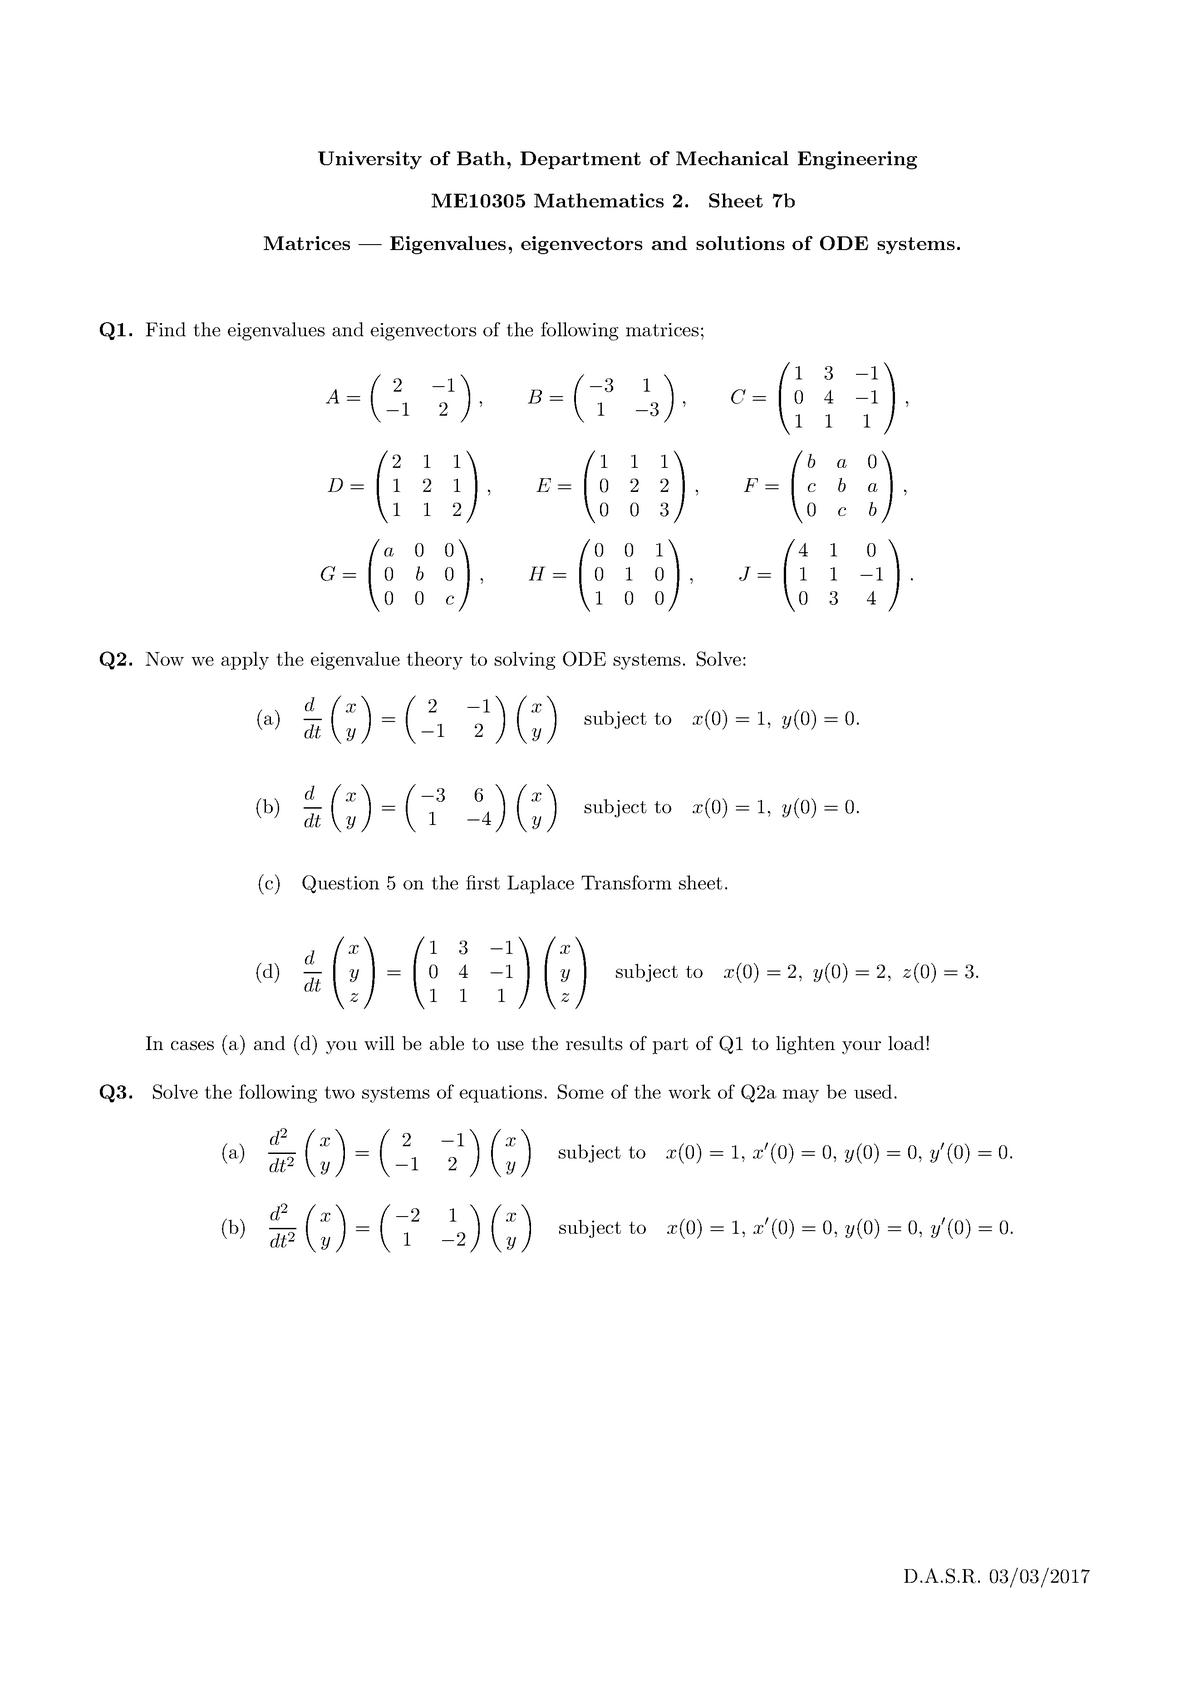 ME10305 2016-2017 Problem Sheet 7b - Eigenvalues